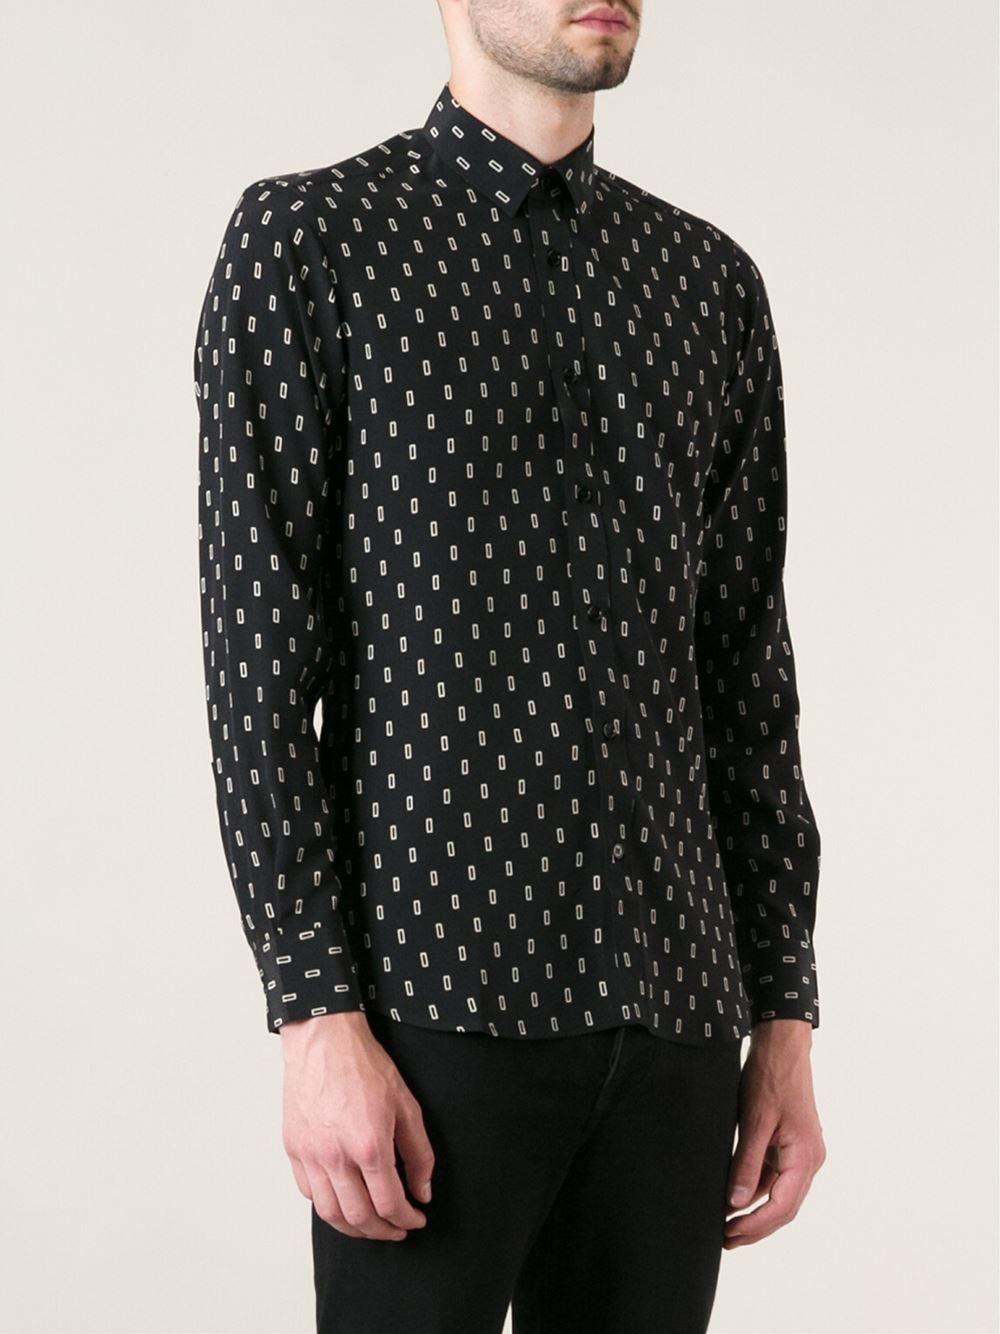 Lyst Saint Laurent Printed Shirt In Black For Men